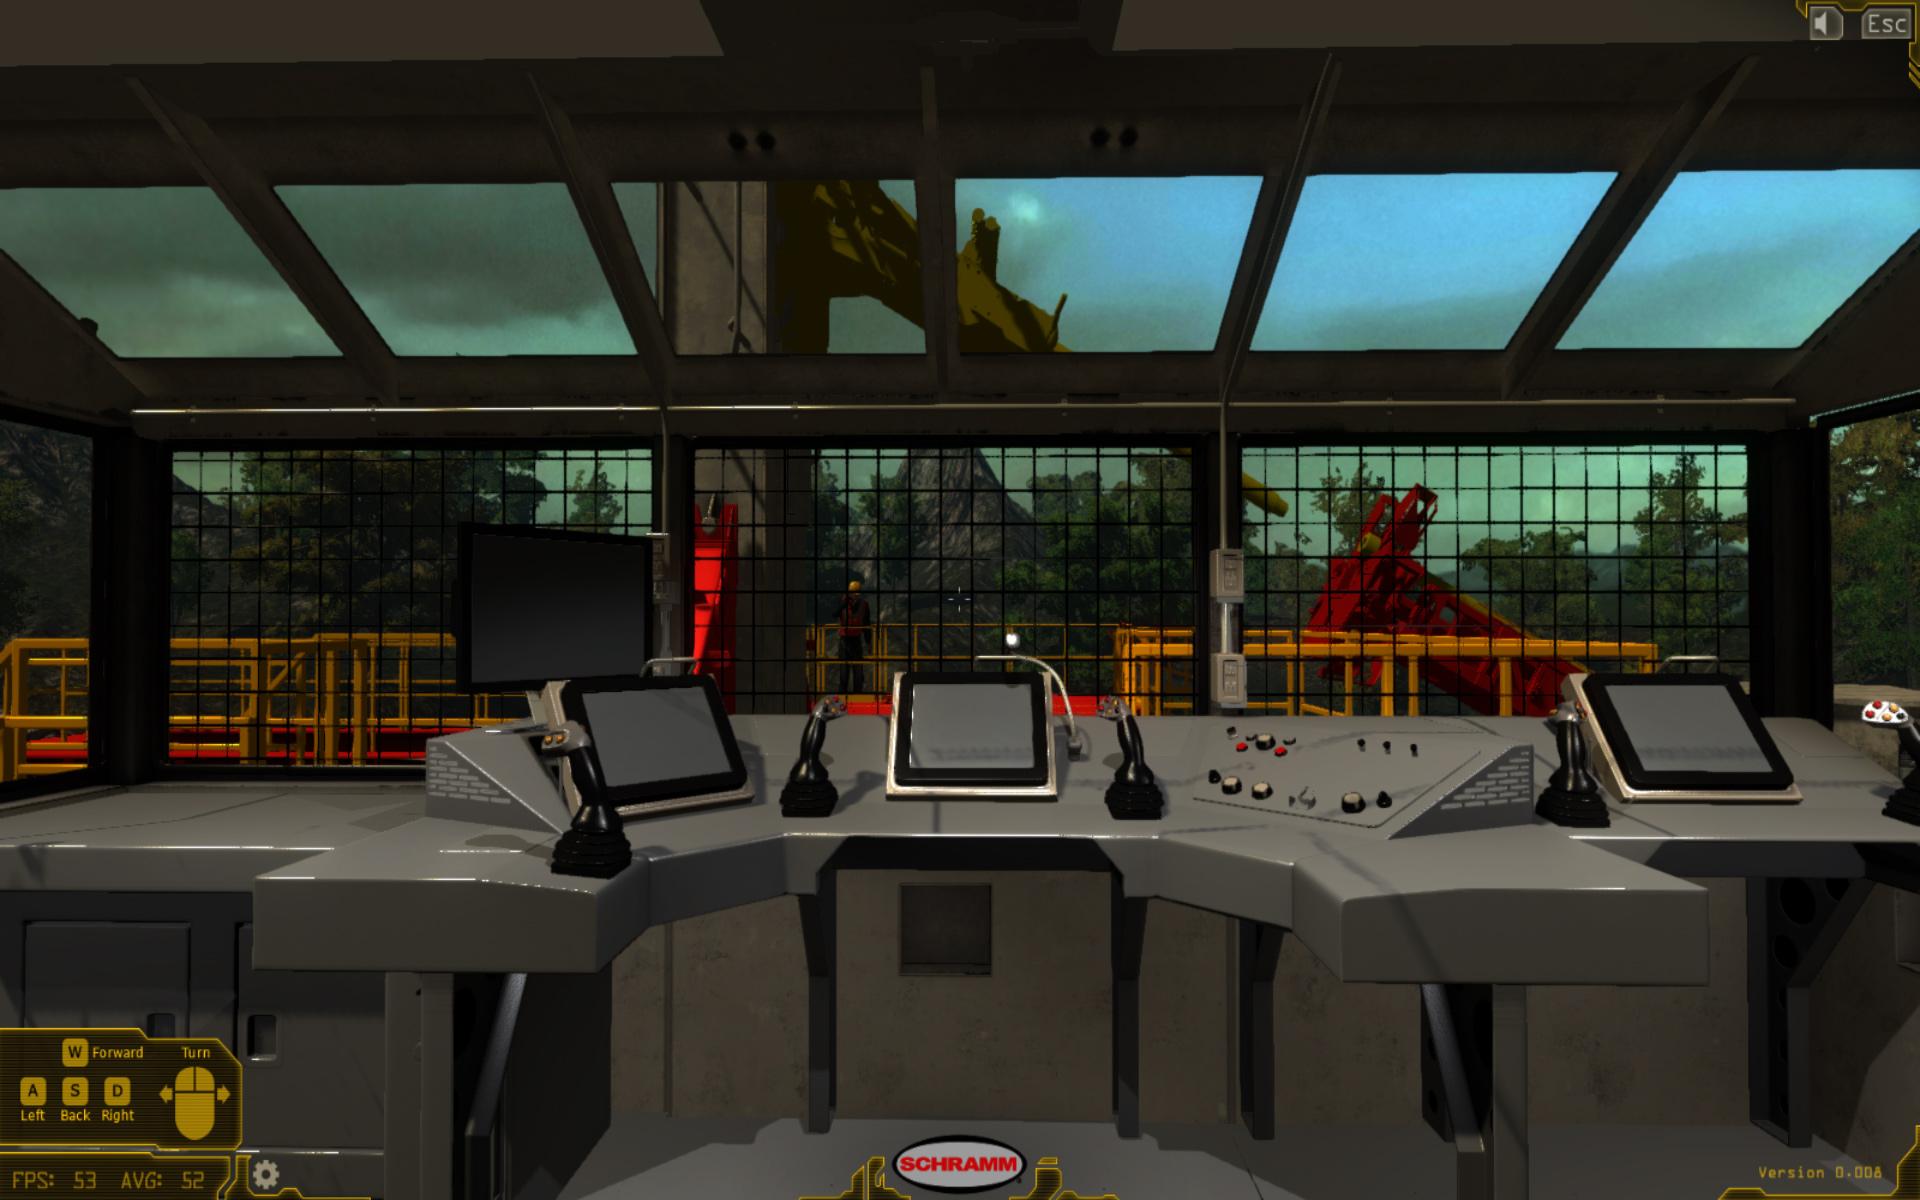 Simulation-Based Drilling Rig Training Simulator